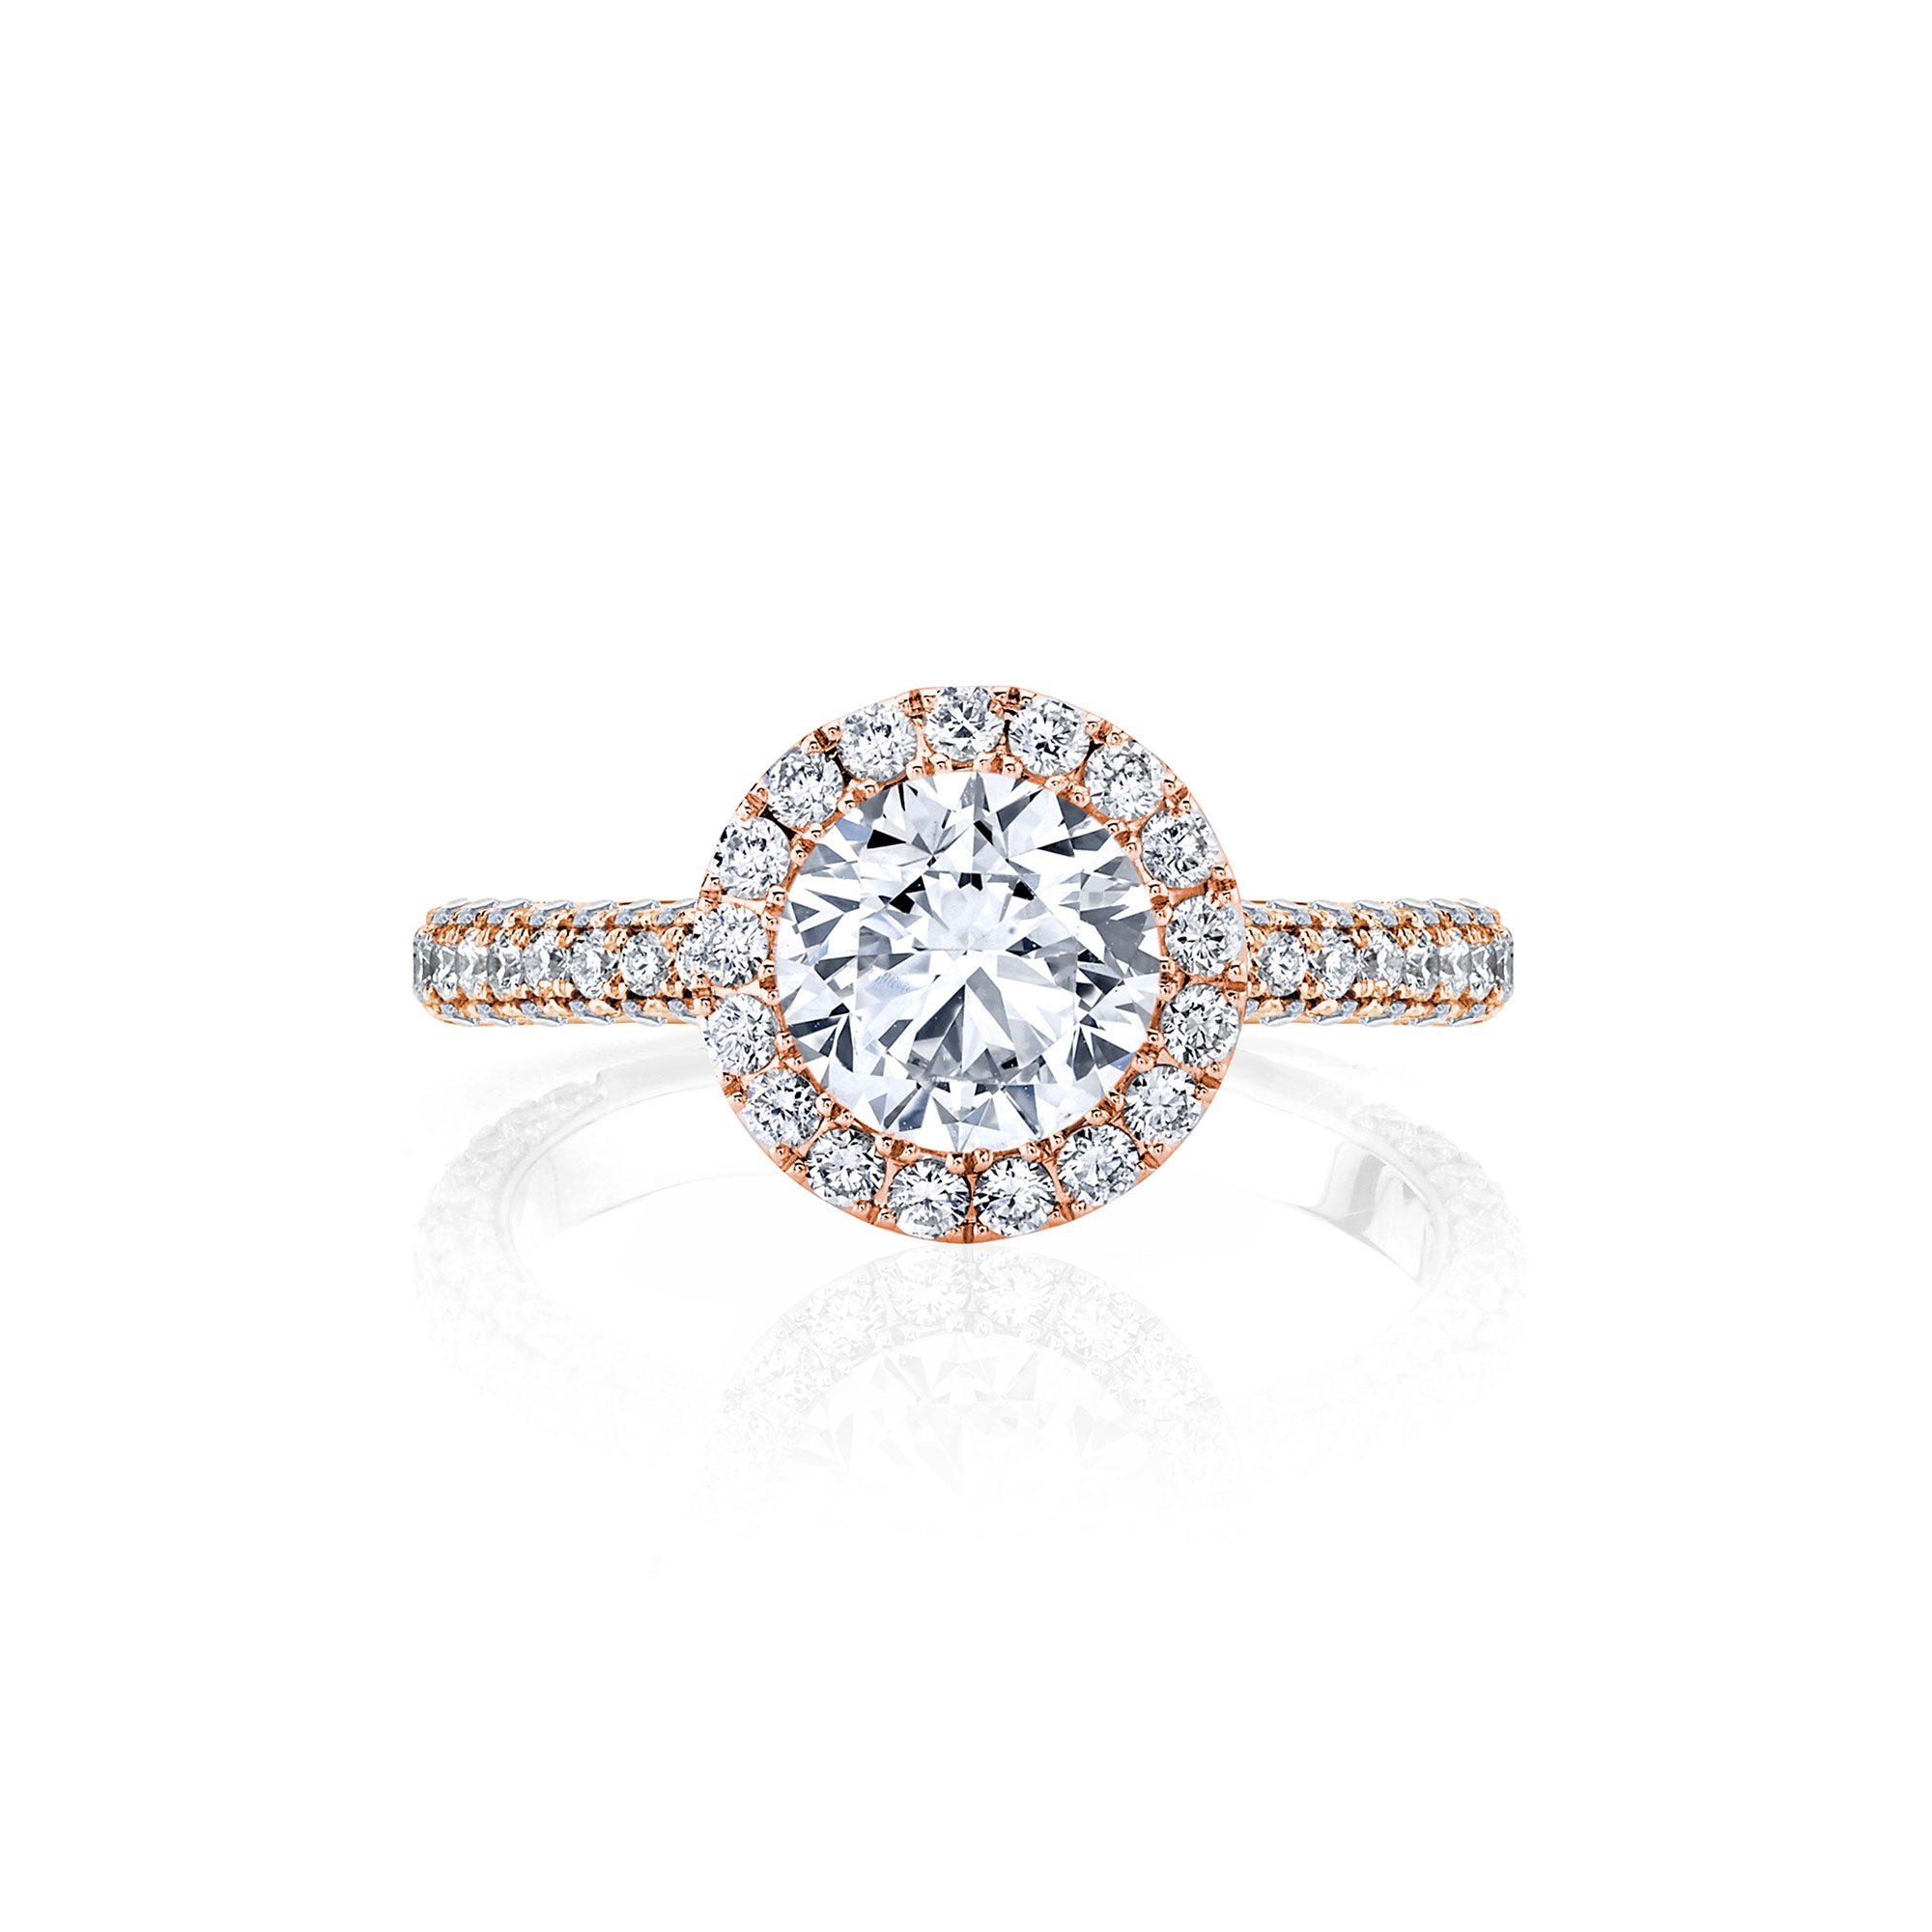 Jacqueline Seamless Halo® Round Brilliant Engagement Ring 18k Rose Gold Front Shot